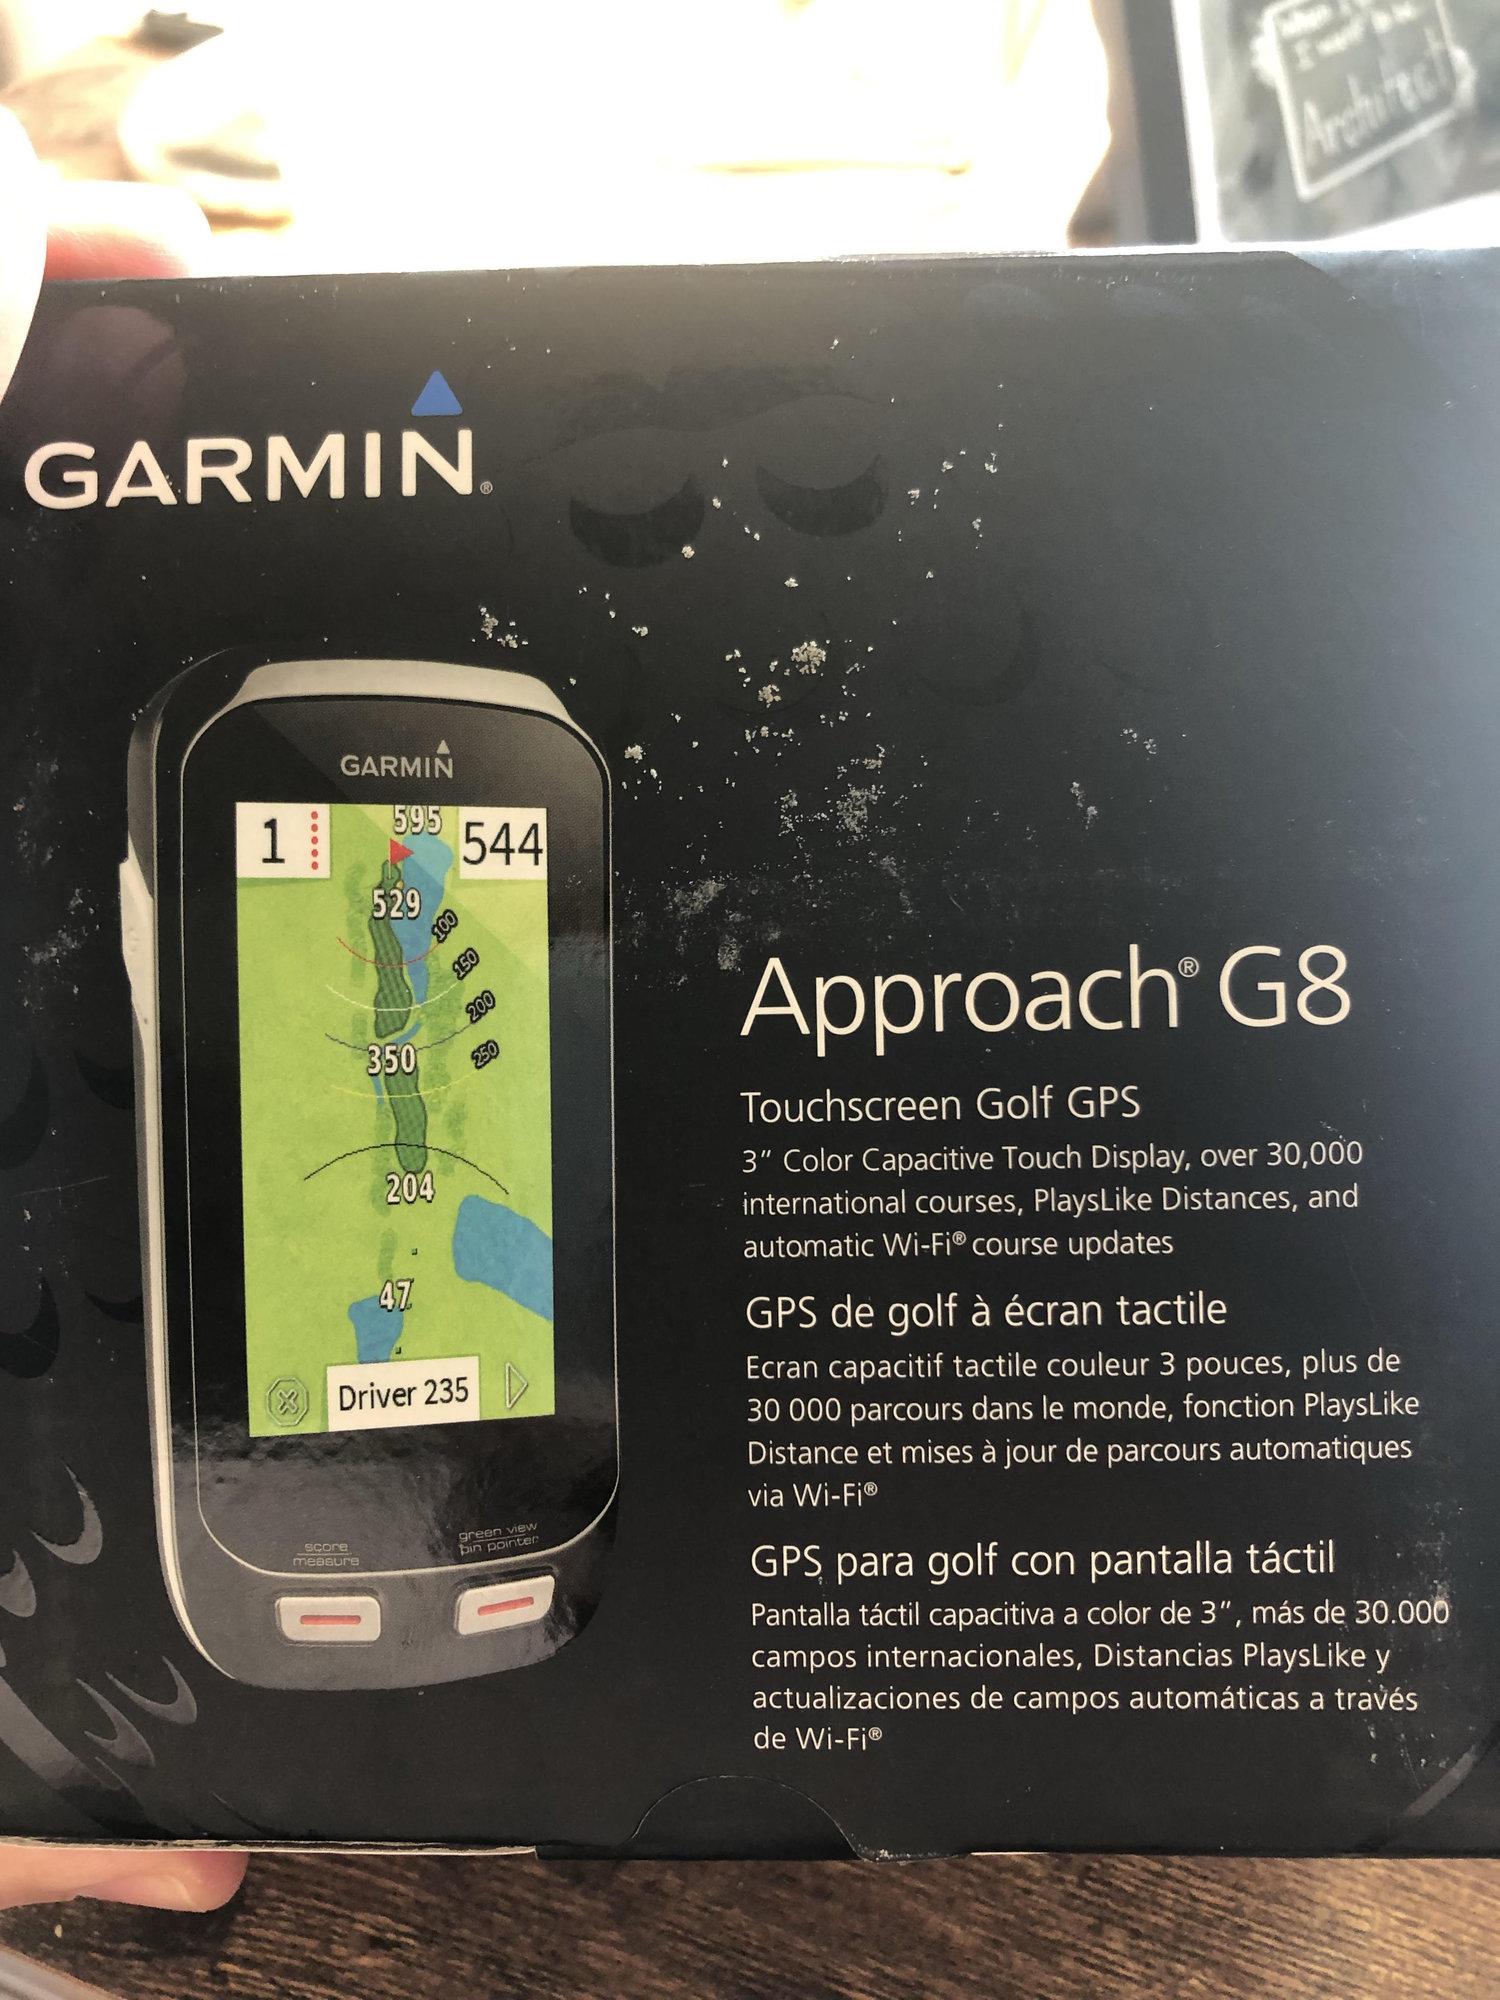 Garmin G8 Approach Original Box and receipt  Great shape  — GolfWRX